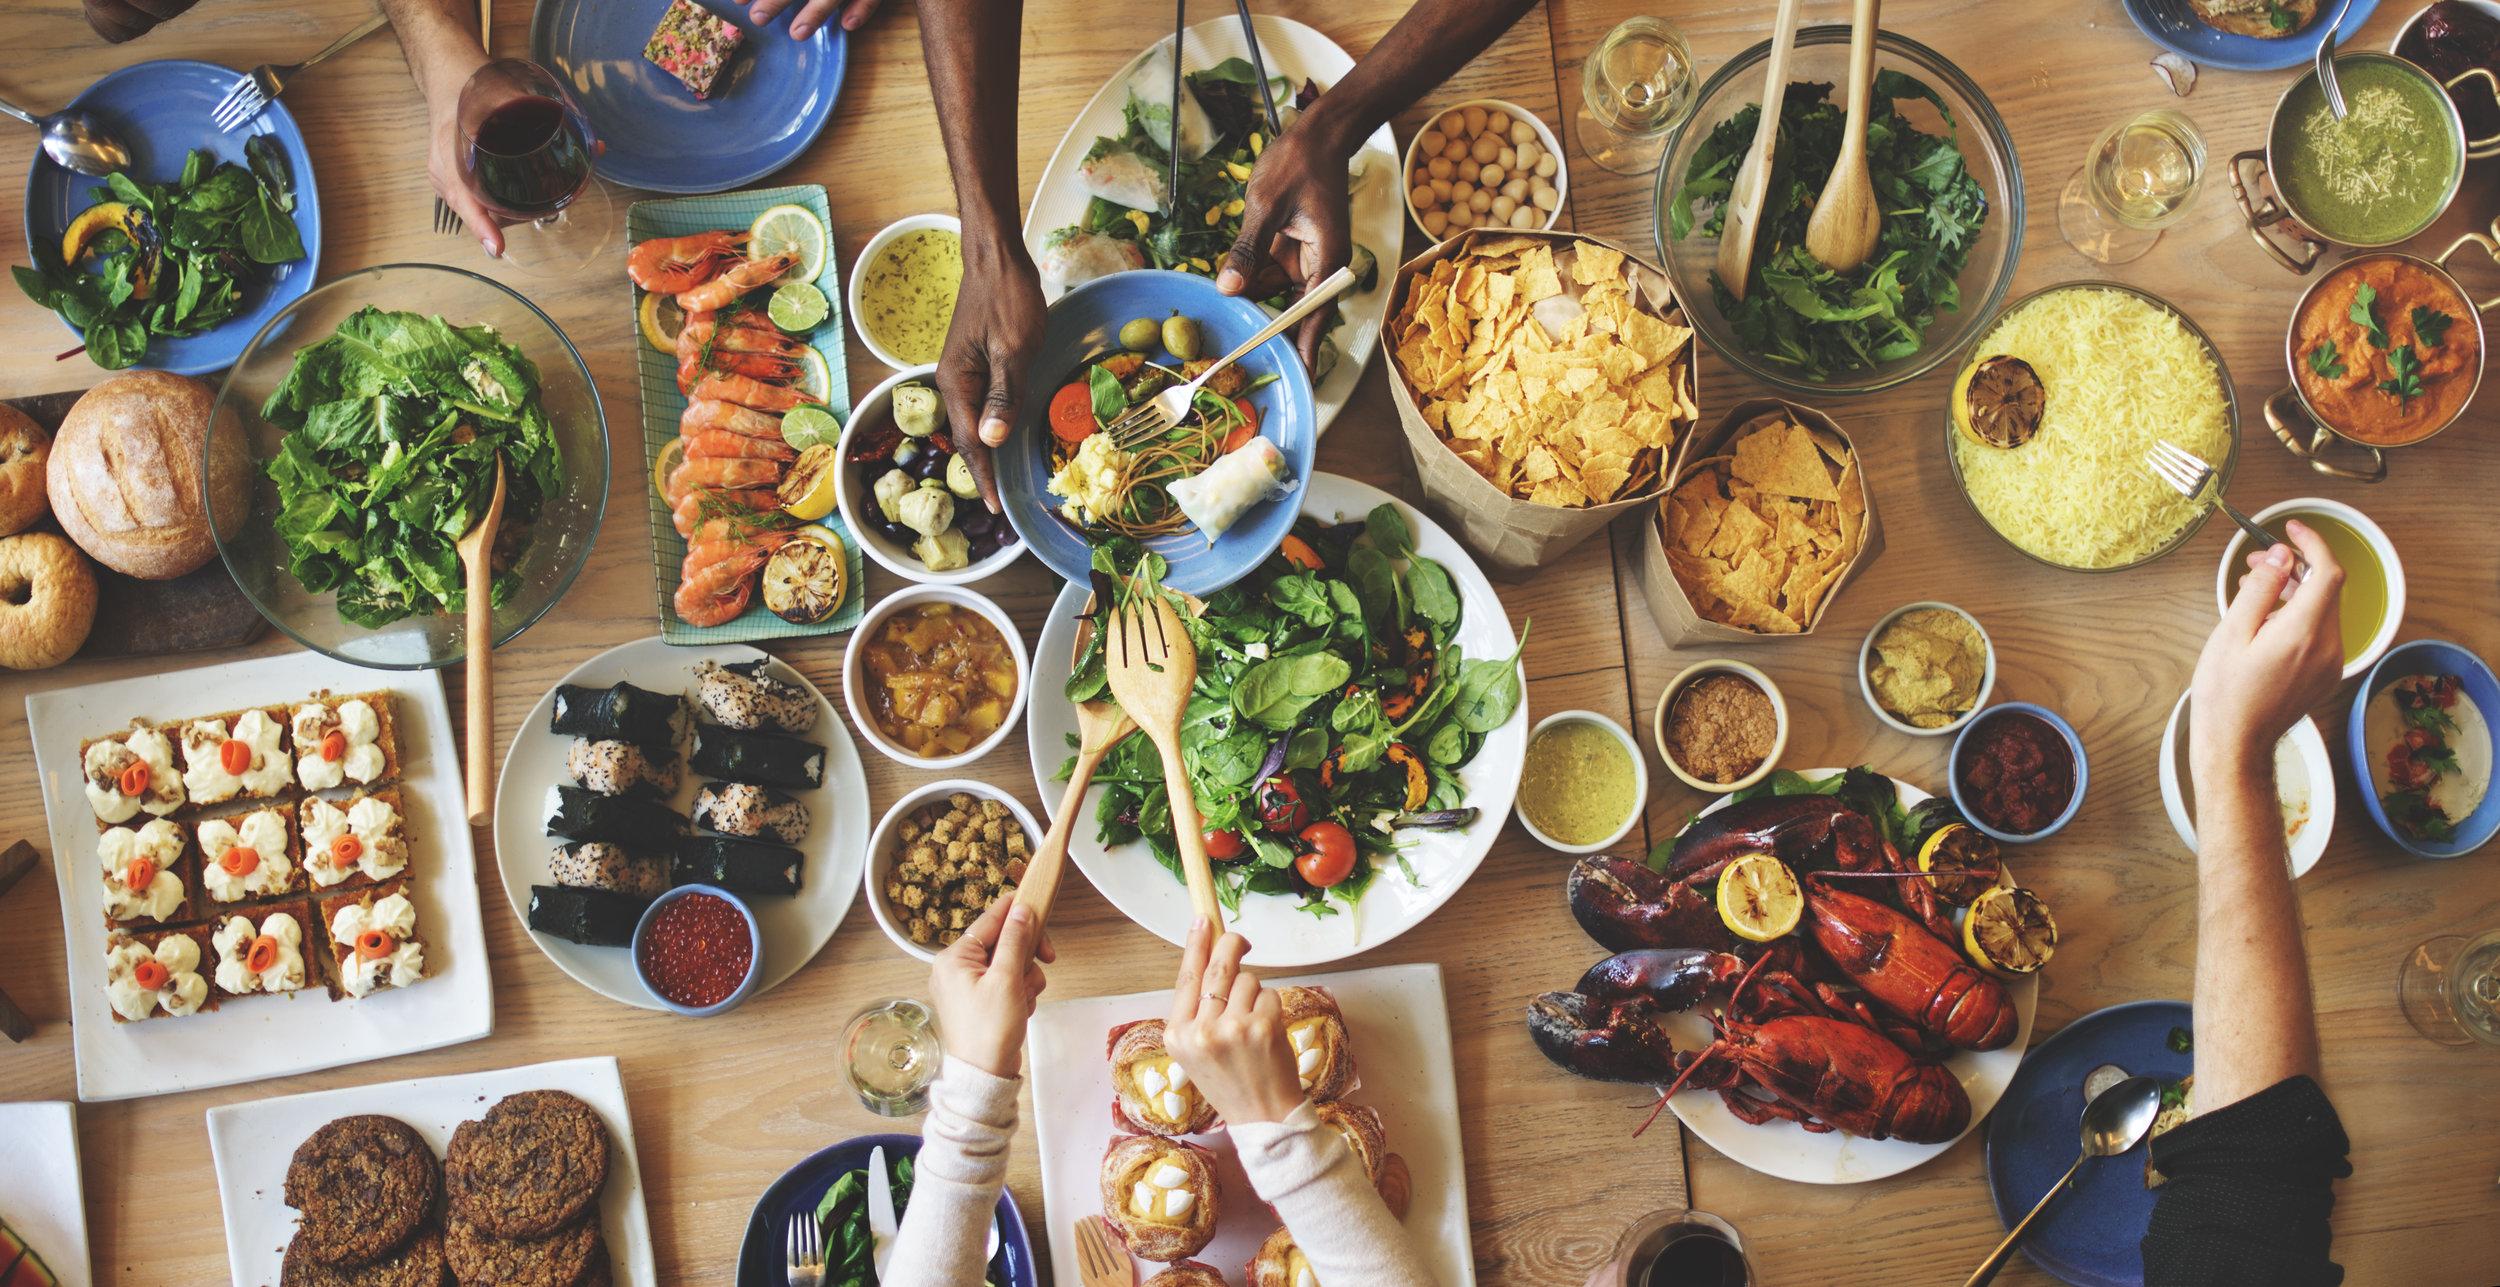 brunch-choice-crowd-dining-food-options-eating-PKBDQR8.jpg